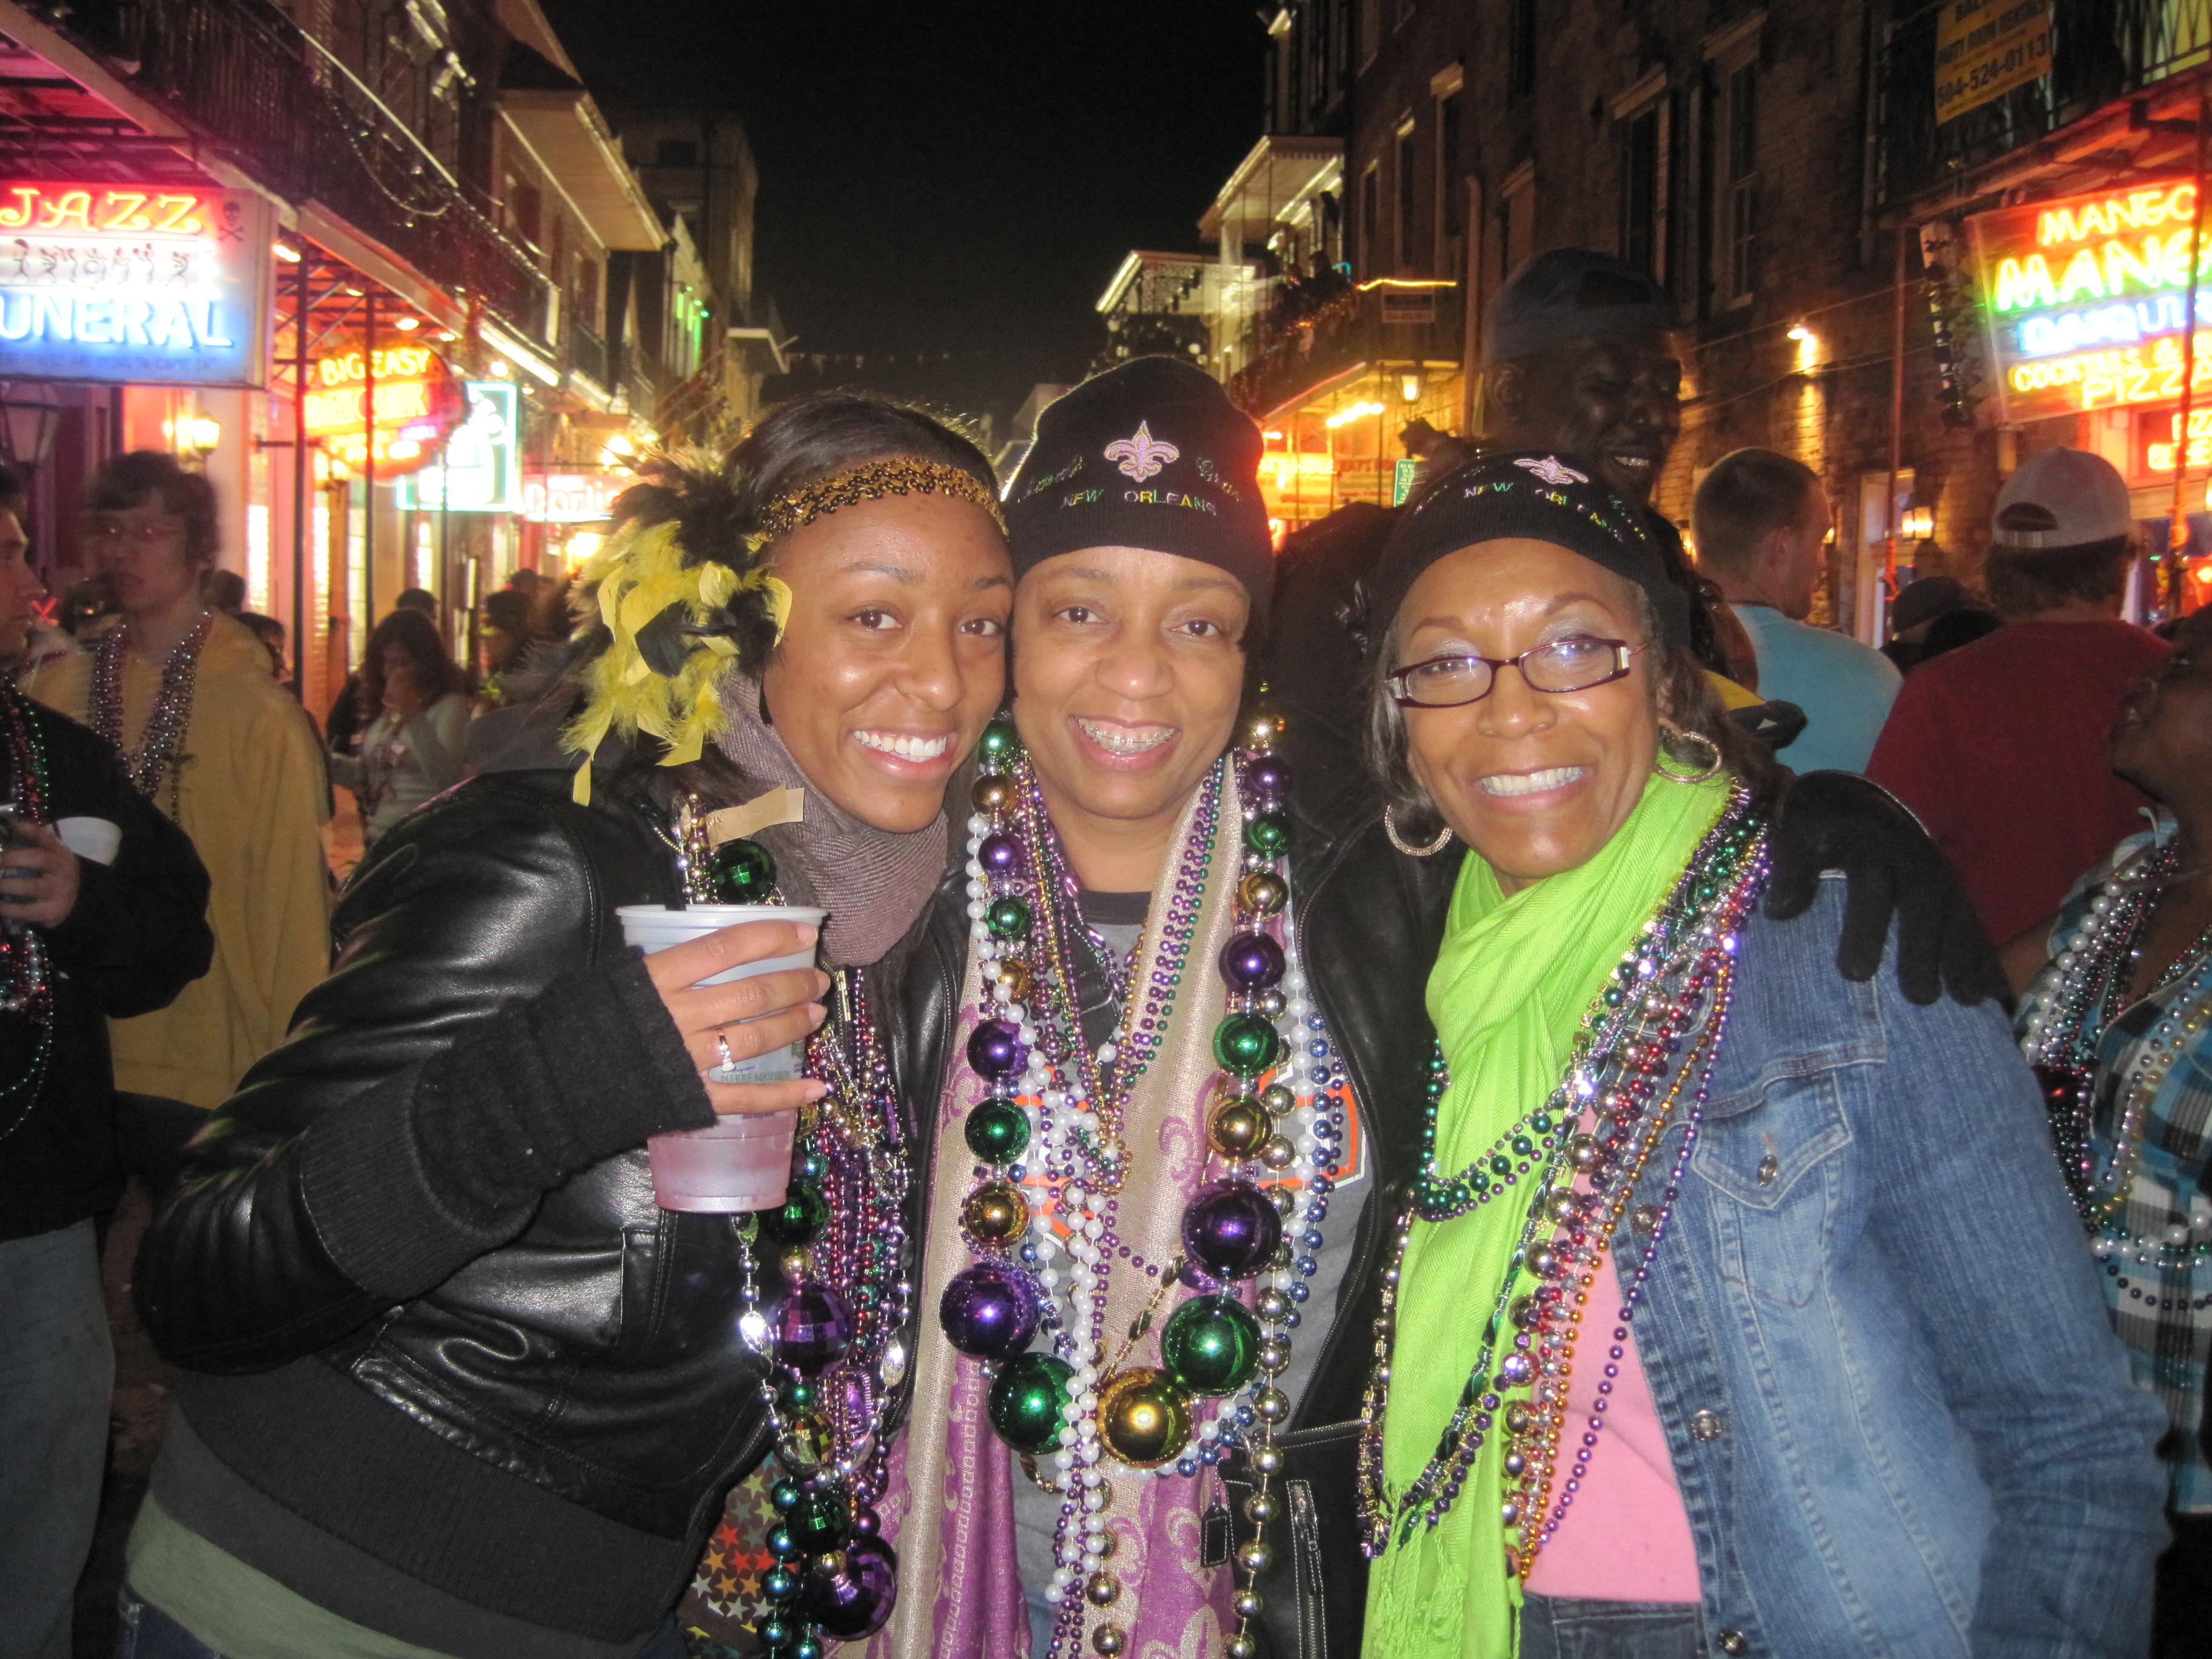 Mardi gras big ass Mardi Gras Memories Part 2 Shayla Martin Shayla Martin